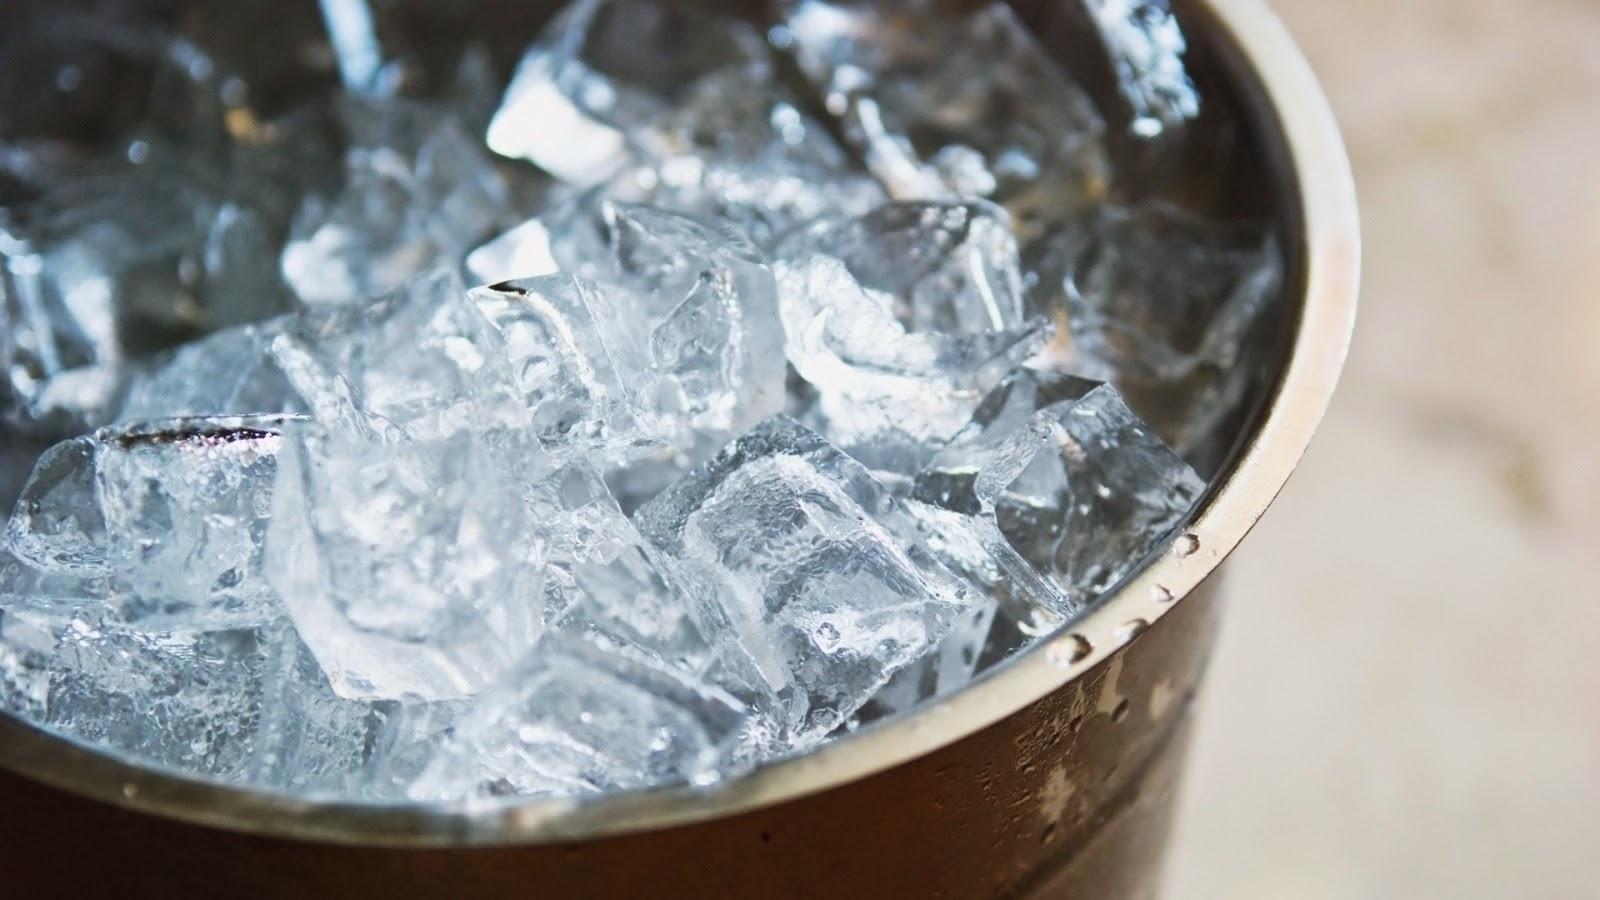 Hajlabor ice bucket challenge ALS hajszövet analízis ólom